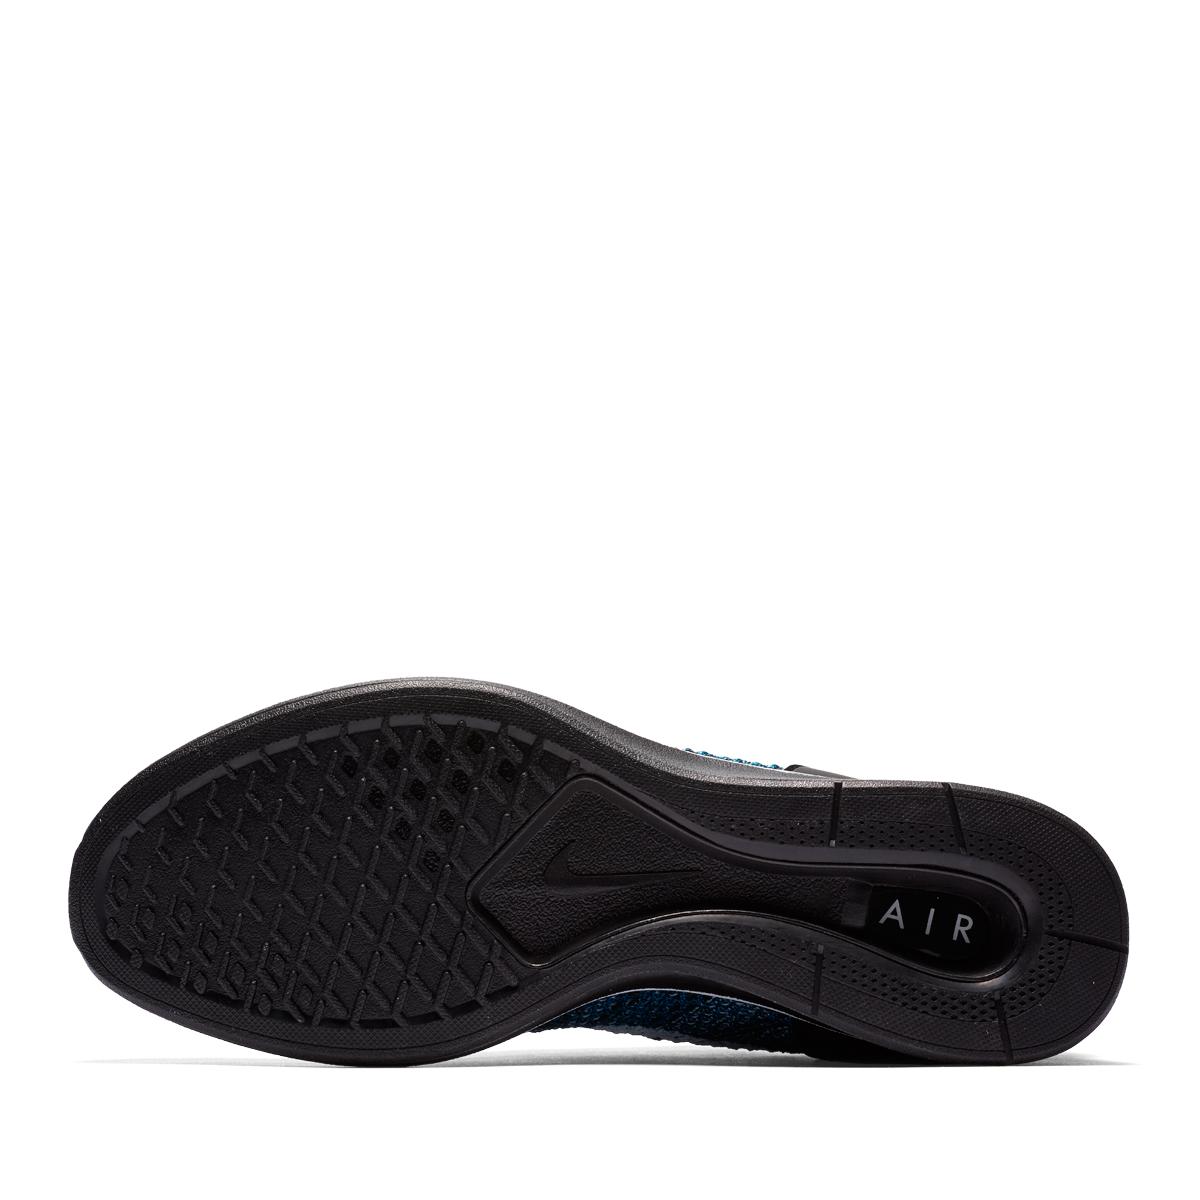 192903f36c22b NIKE AIR ZOOM MARIAH FLYKNIT RACER (Nike air zoom Maria fly knit racer) GREEN  ABYSS BLACK-CIRRUS BLUE-WHITE 18SP-I